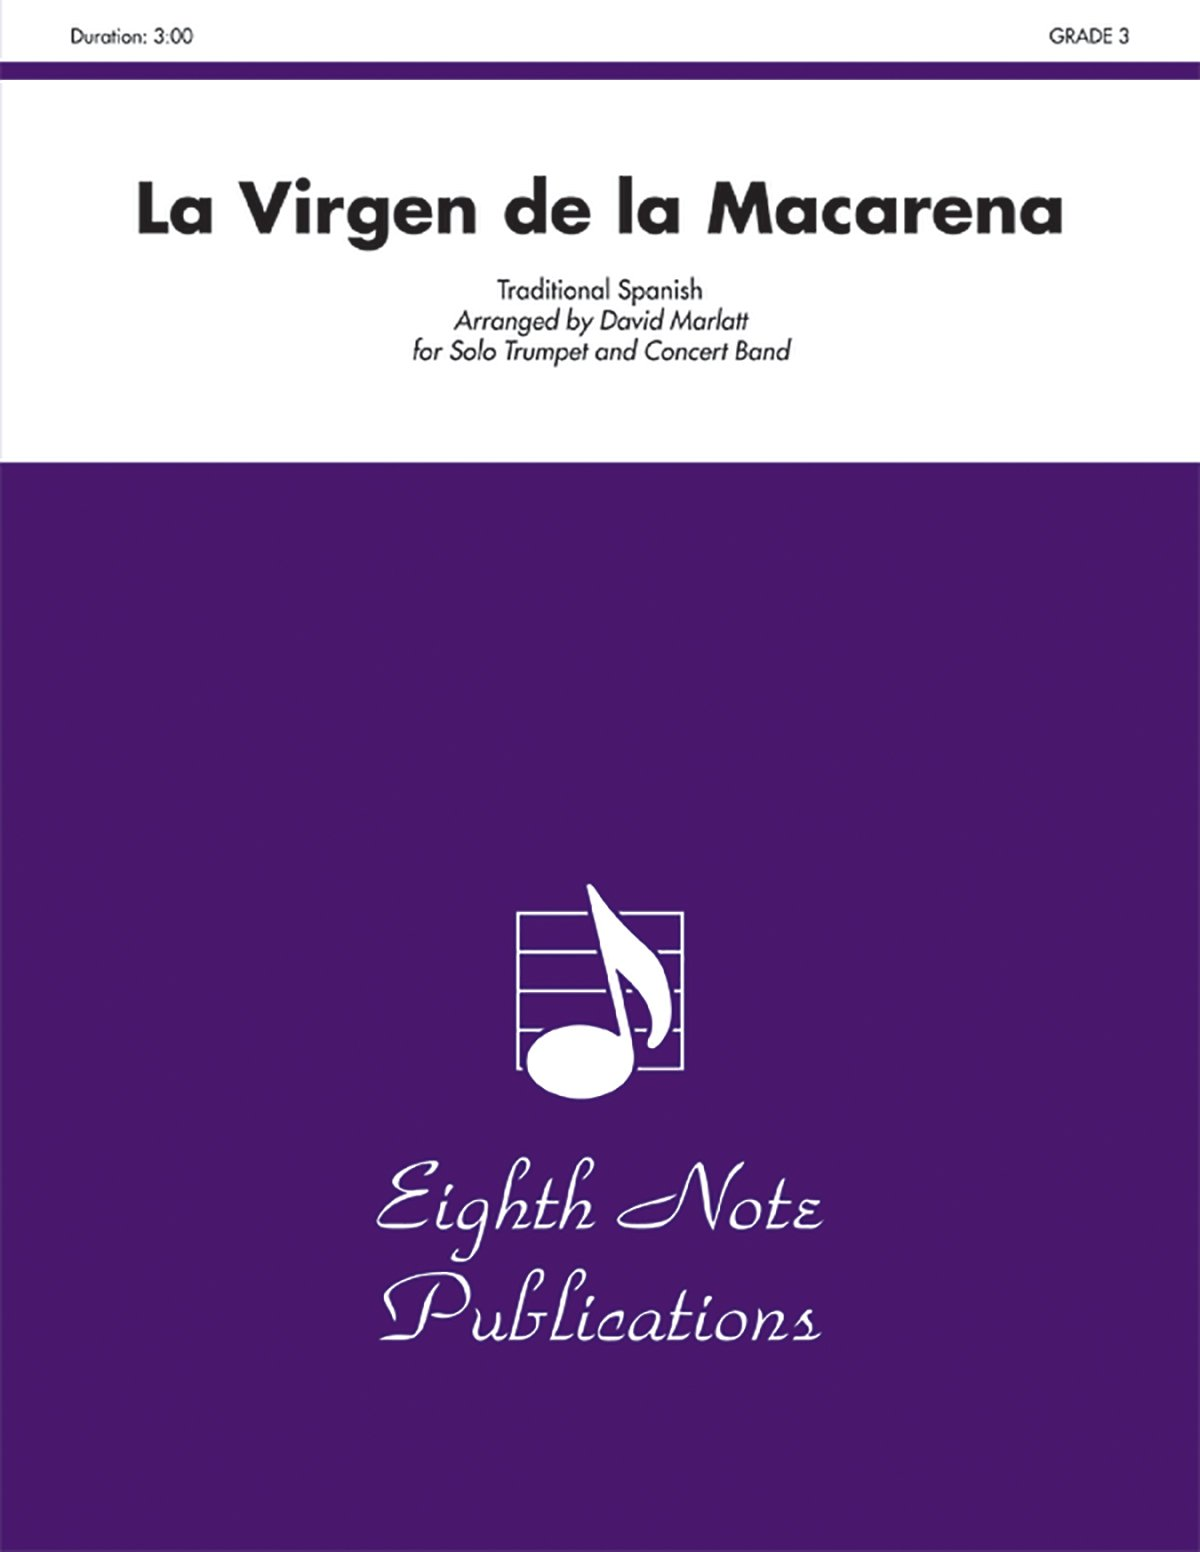 Amazon com: La Virgen de la Macarena: Solo Trumpet and Concert Band